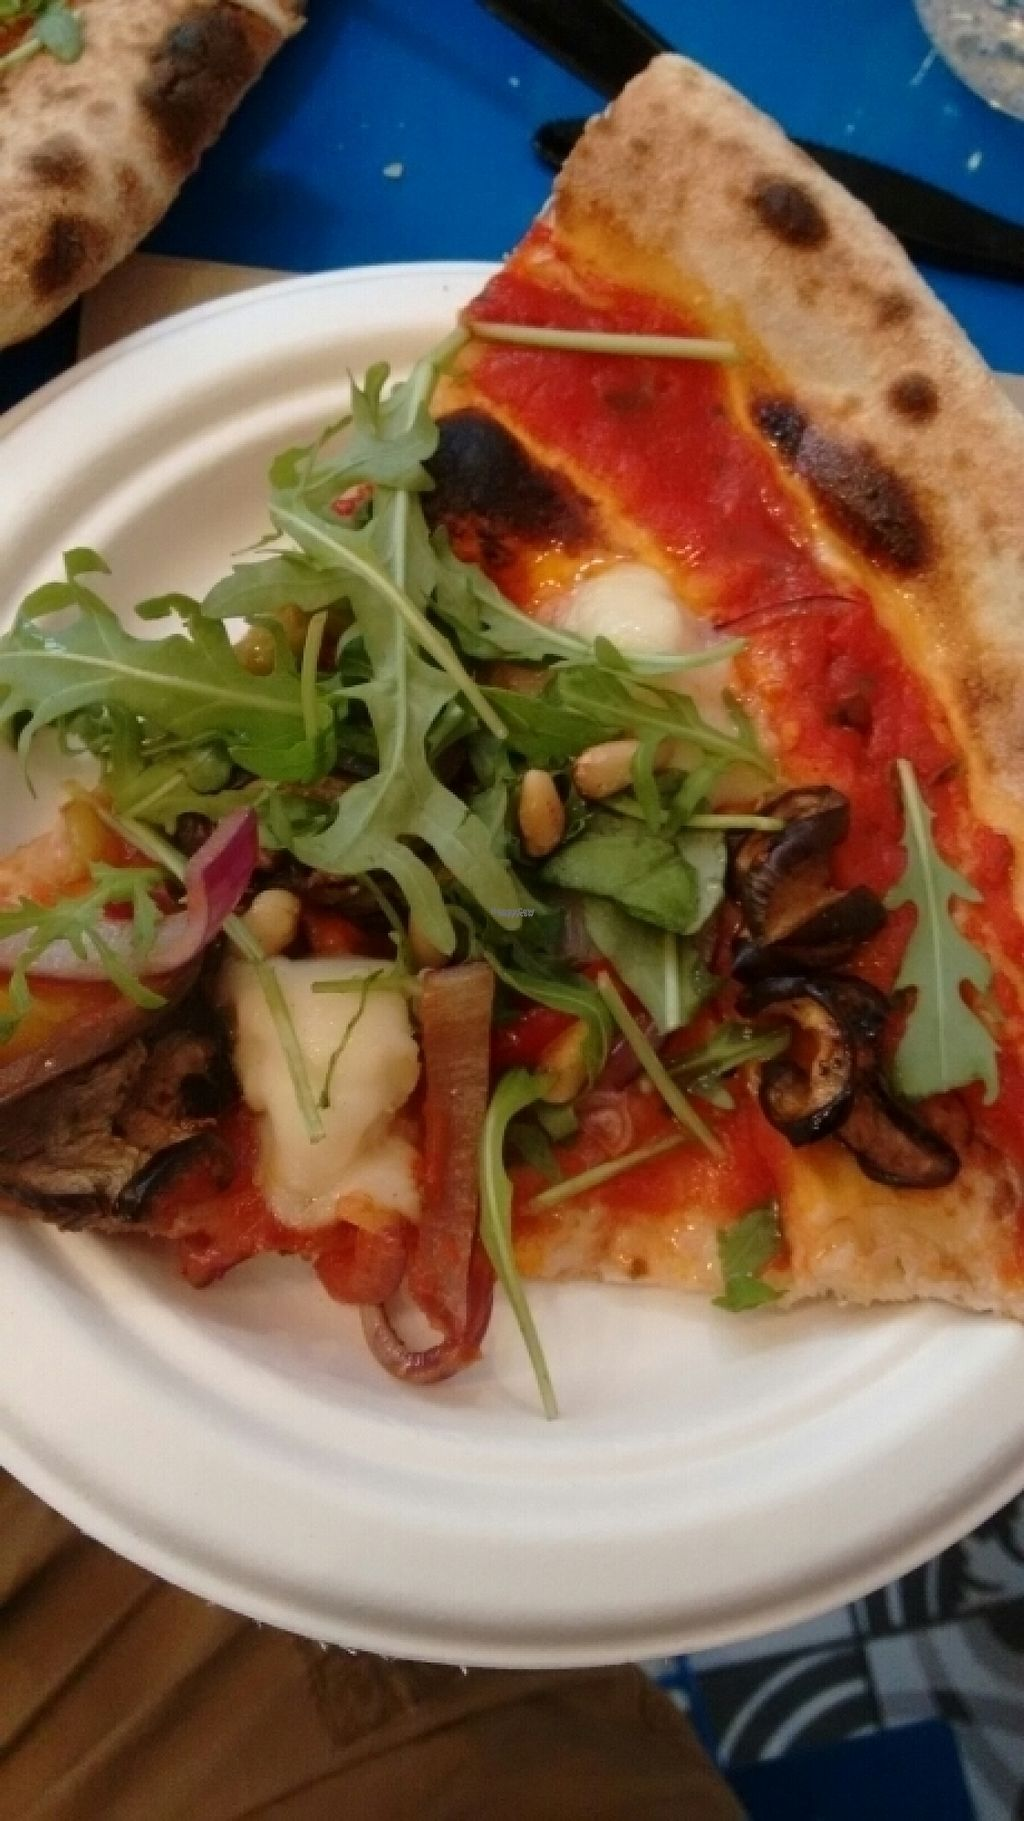 "Photo of Dough Pizzeria  by <a href=""/members/profile/craigmc"">craigmc</a> <br/>slice! <br/> November 3, 2016  - <a href='/contact/abuse/image/80361/186407'>Report</a>"